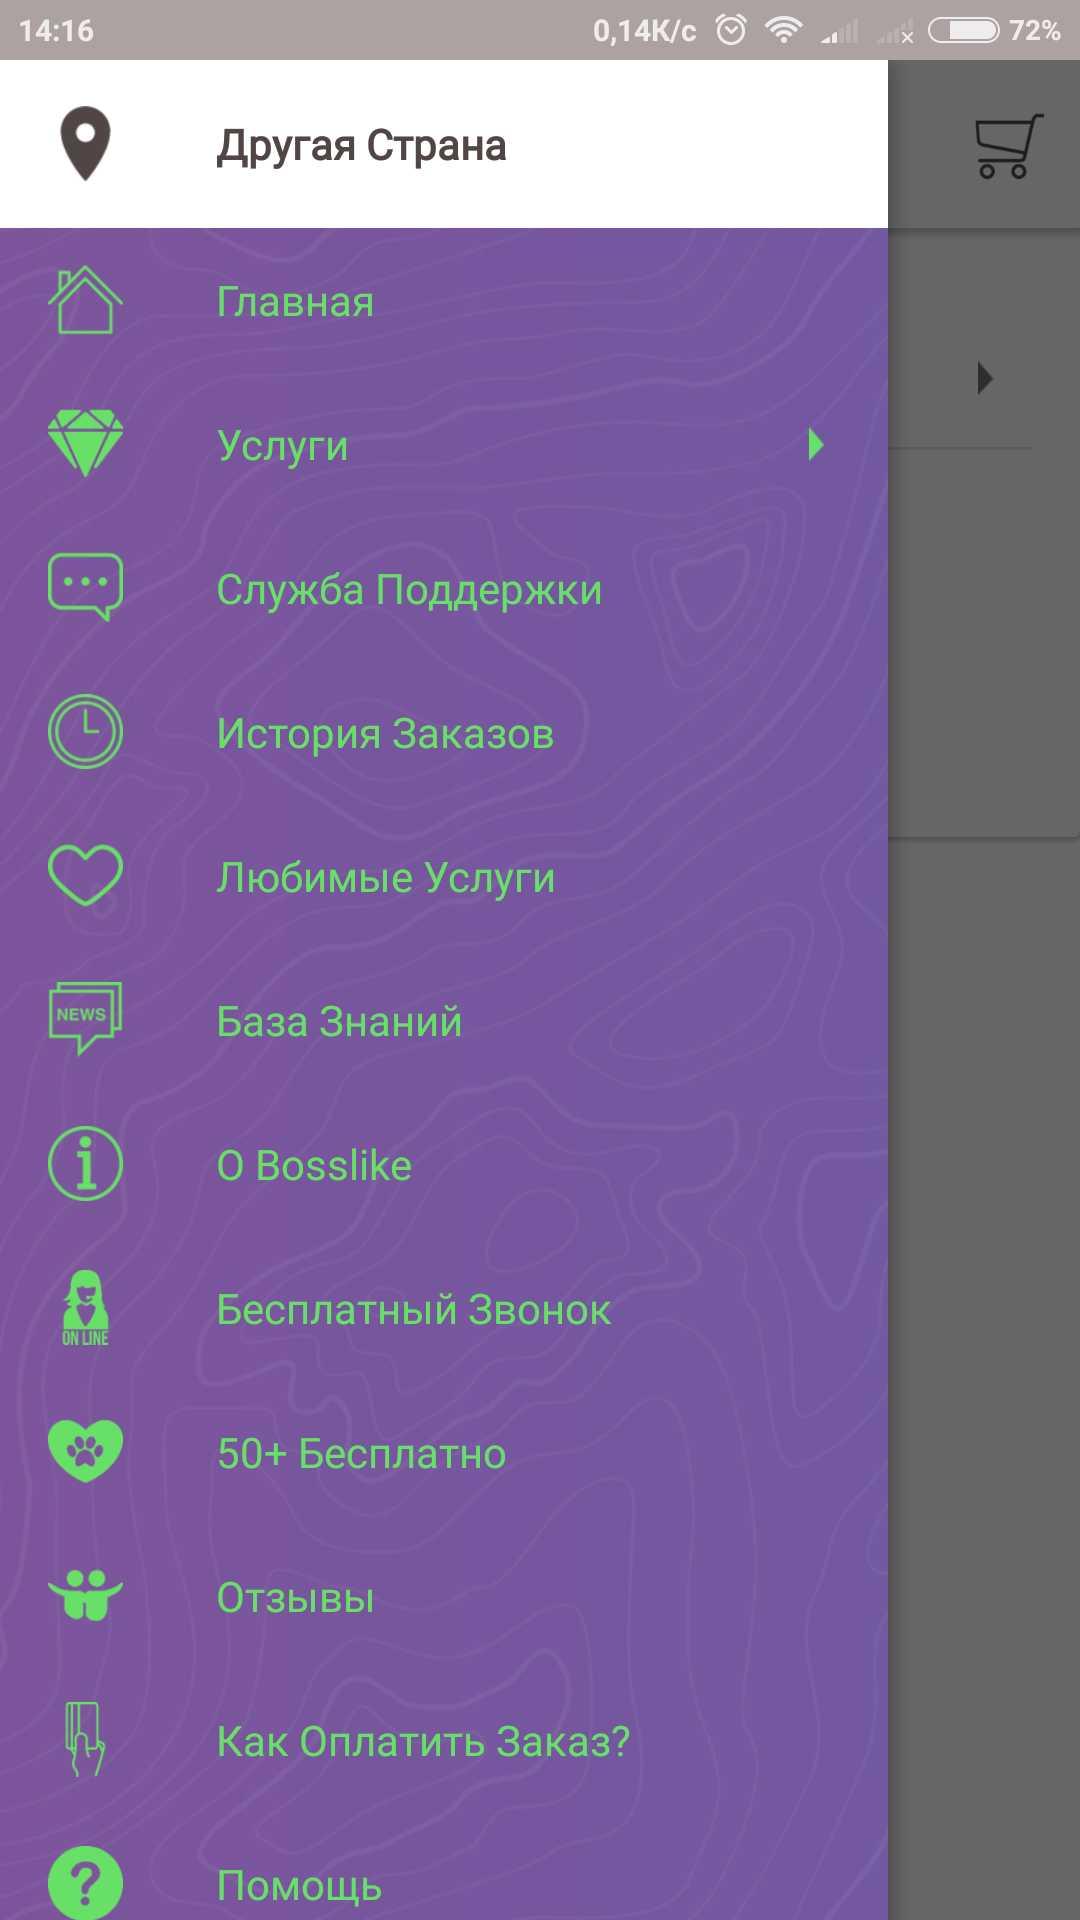 bosslike - приложение для накрутки